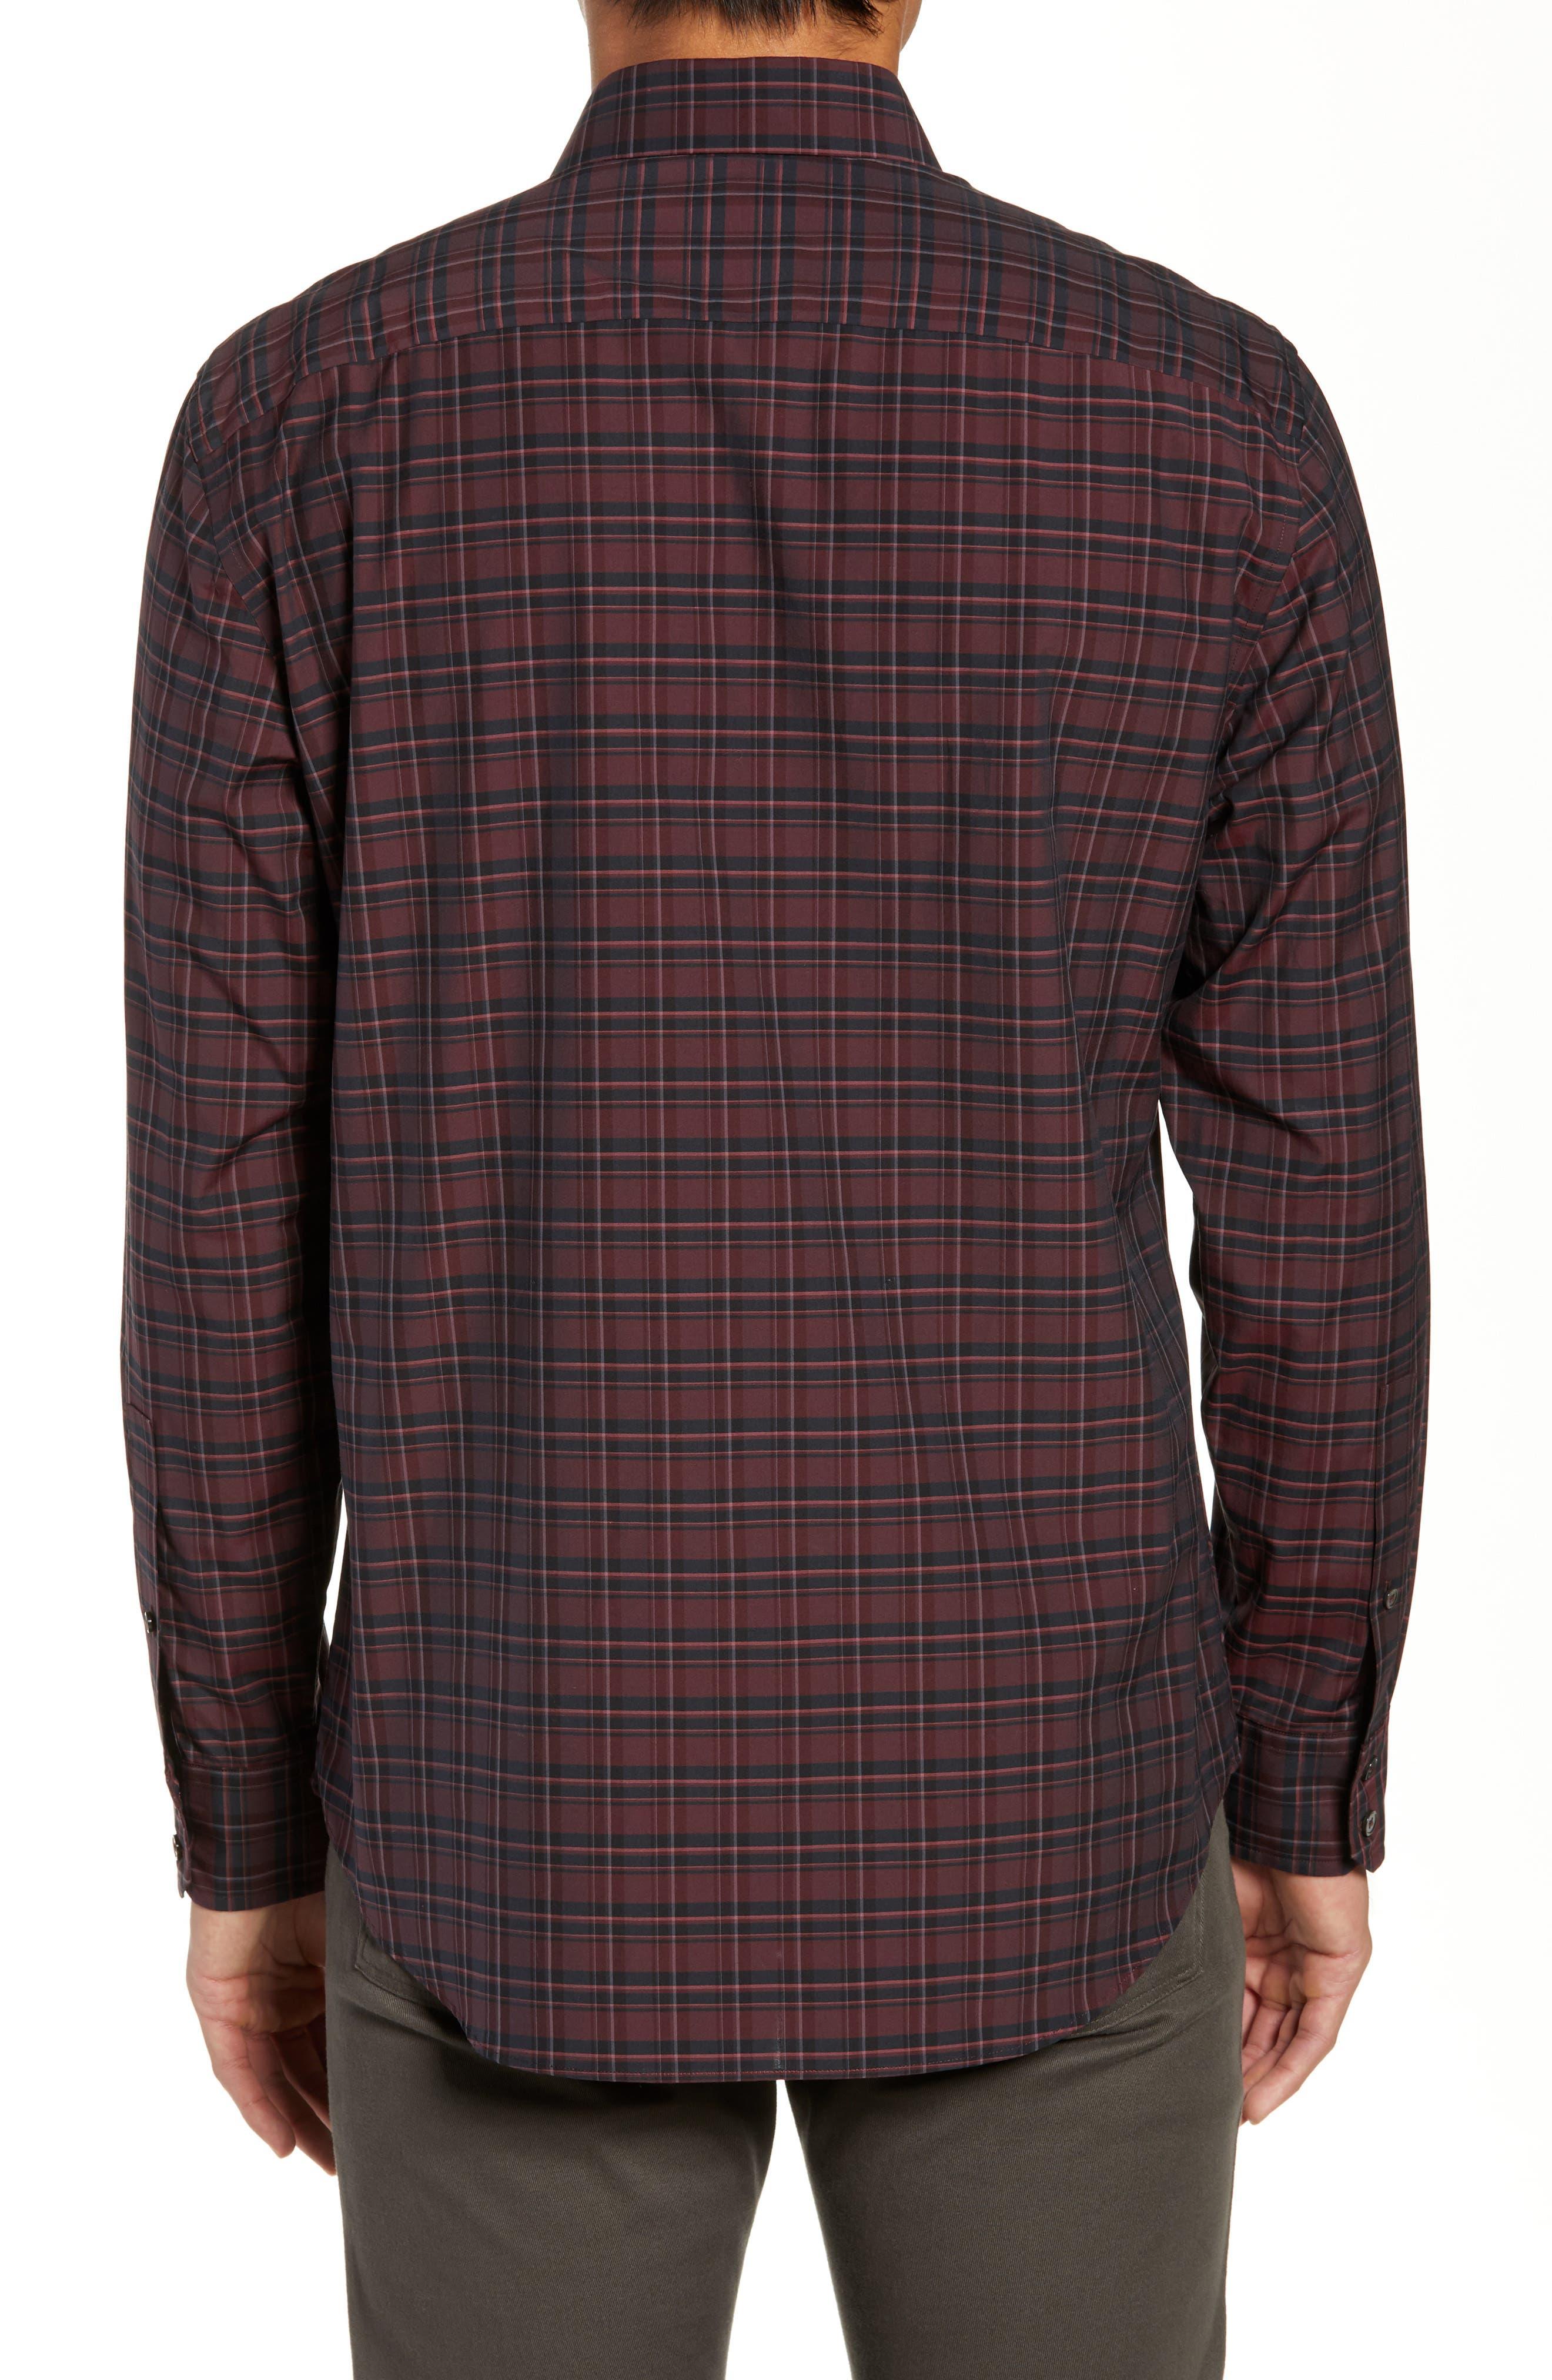 ZACHARY PRELL, Sunny Regular Fit Sport Shirt, Alternate thumbnail 3, color, RUBY